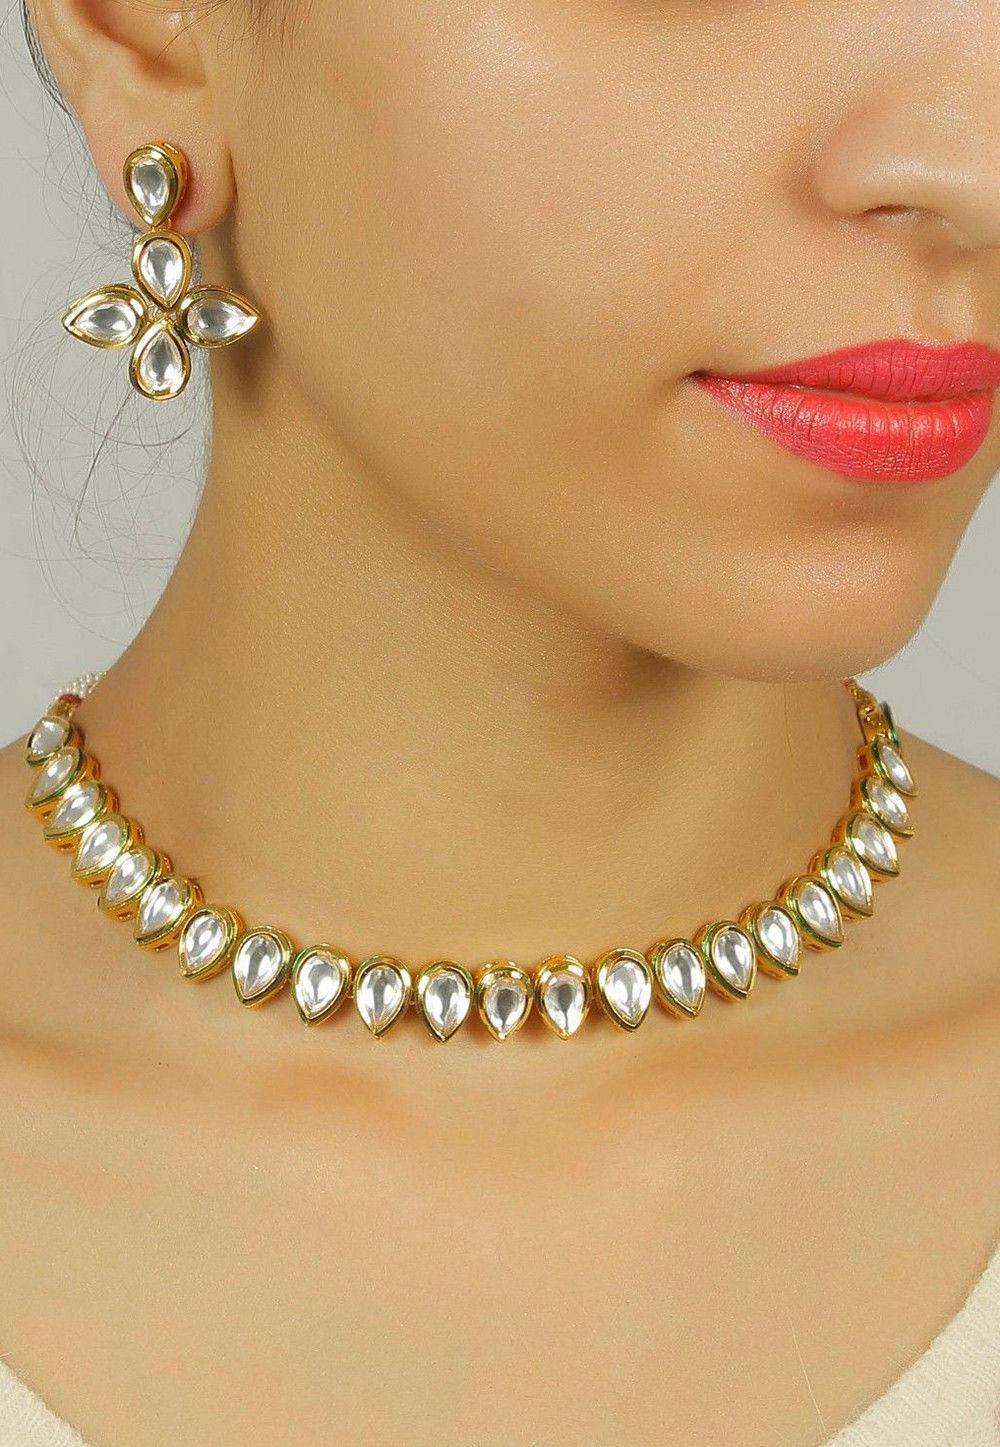 ae336d70255 ... Jewelry; Kundan Necklace Set. Zoom